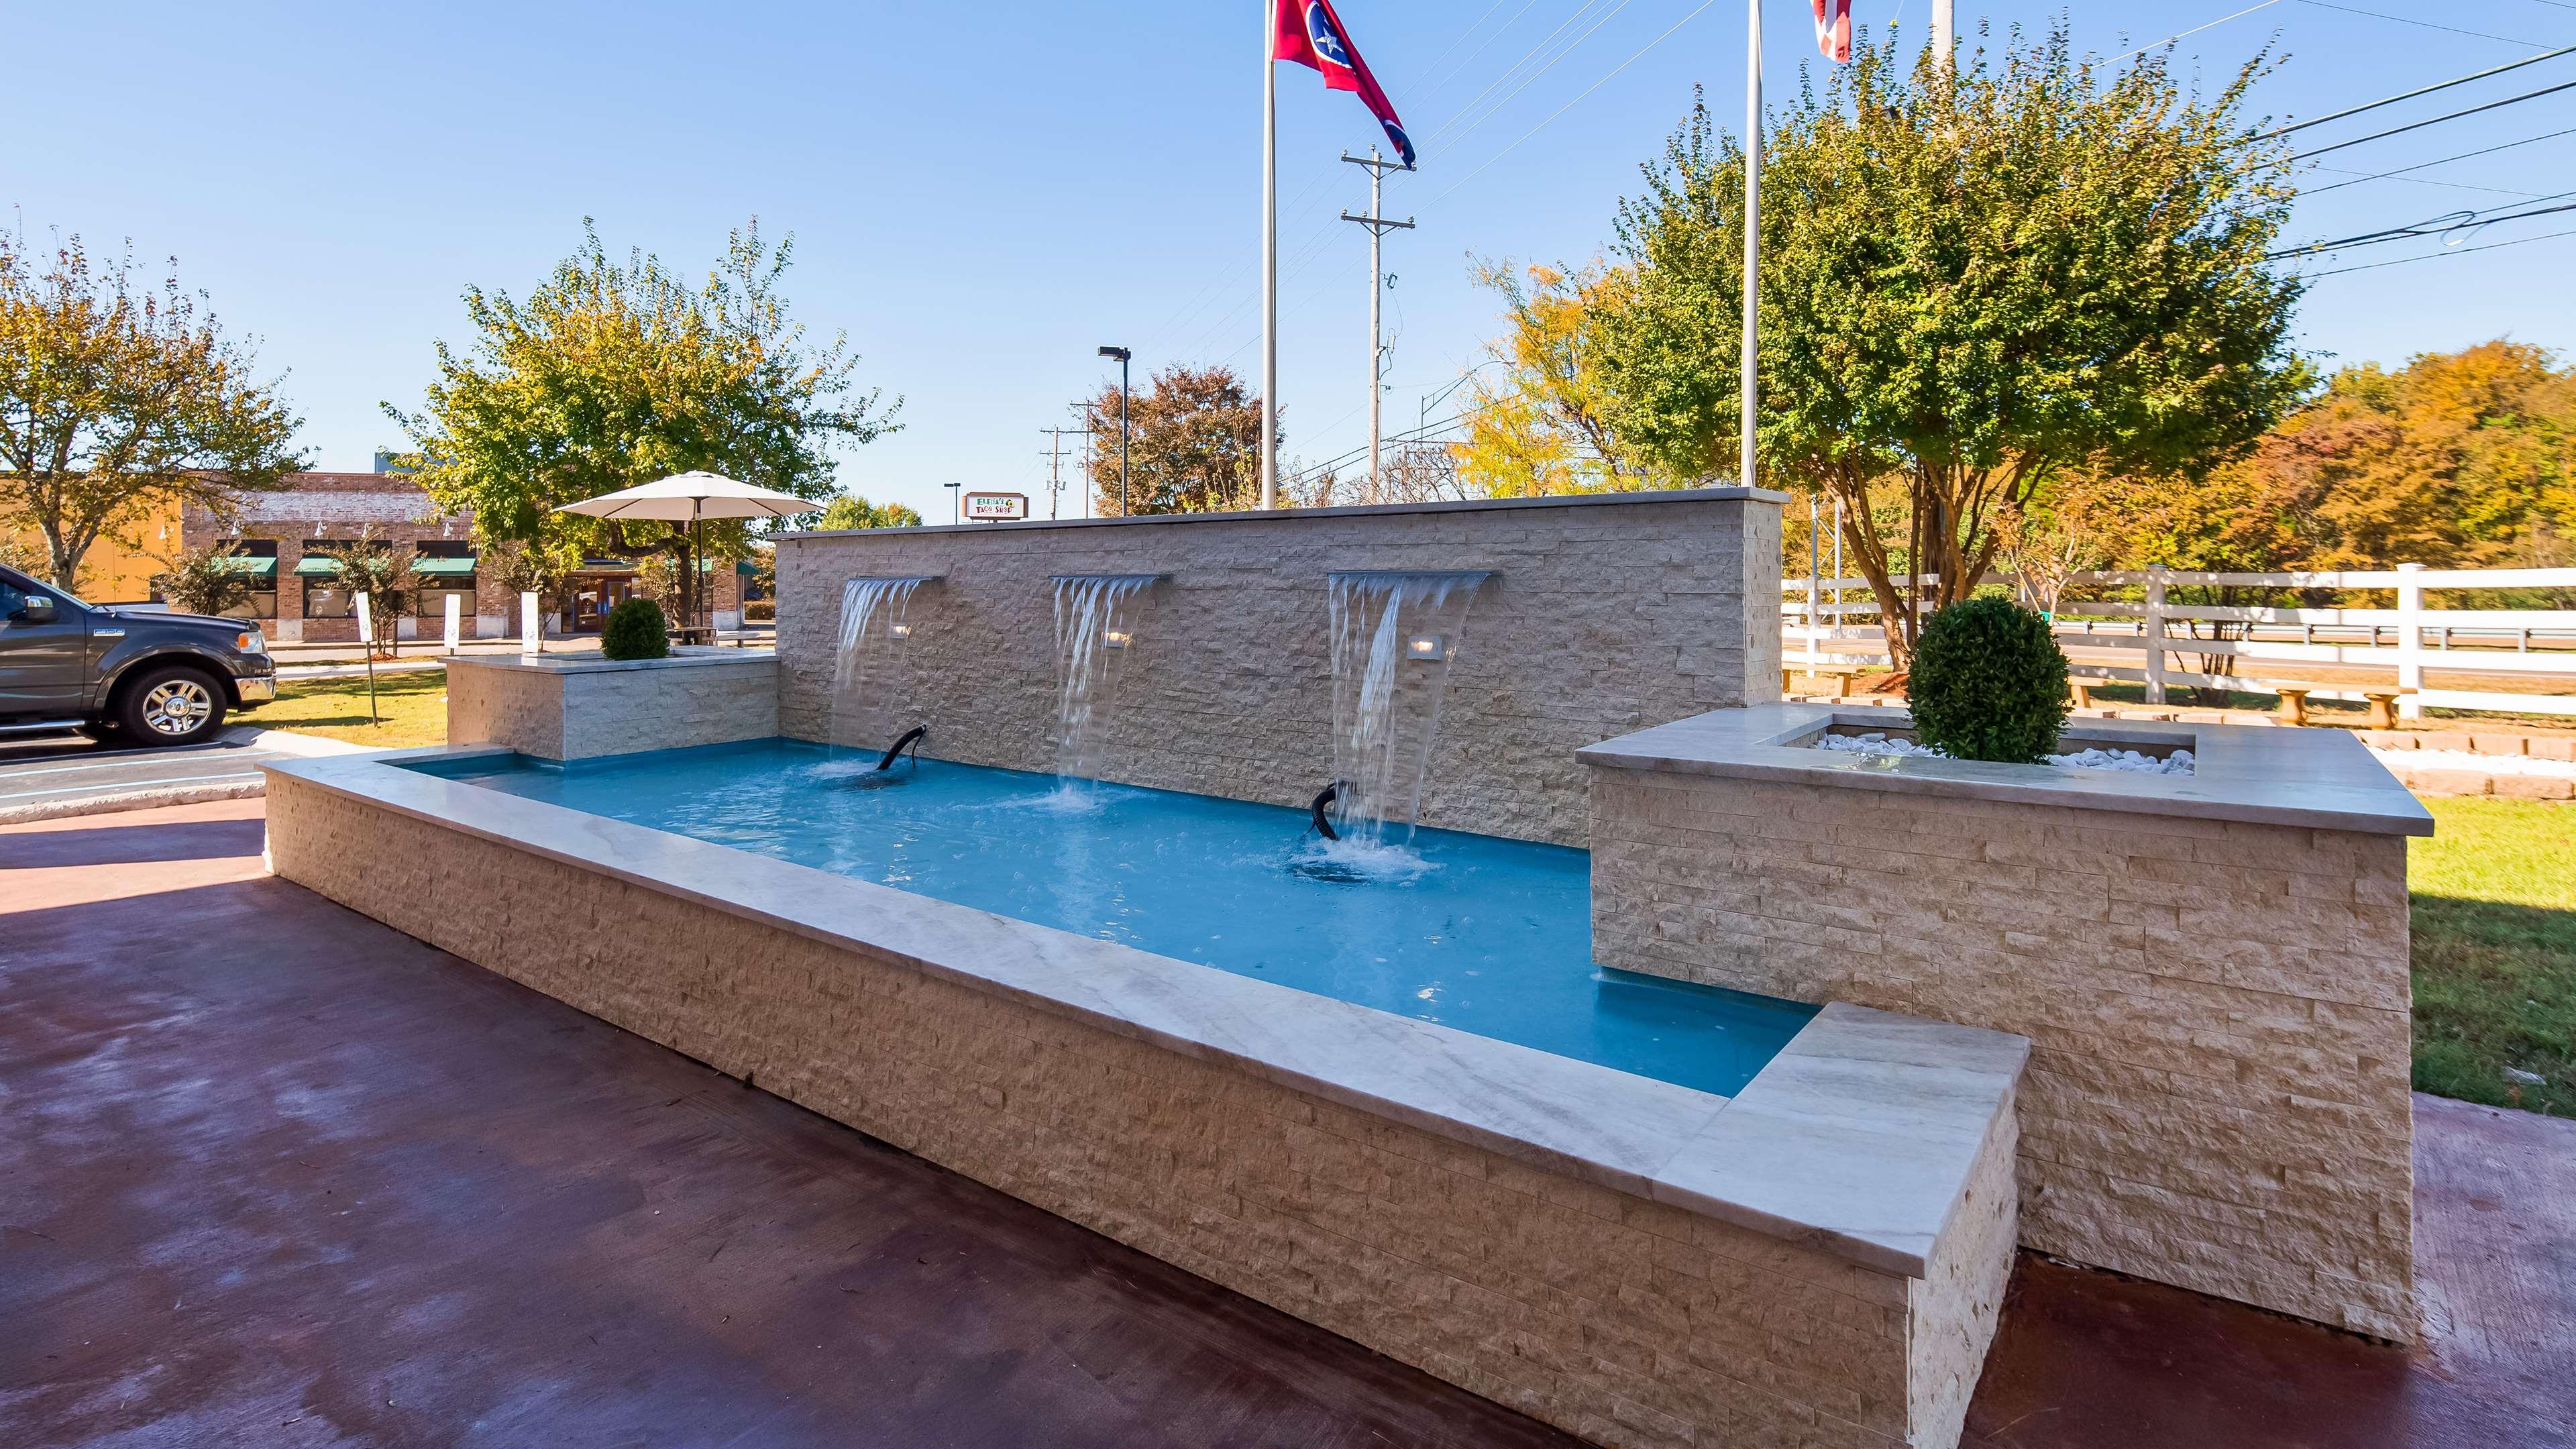 Best Western Plus Galleria Inn Suites At 8635 Us Highway 64 Memphis Tn On Fave